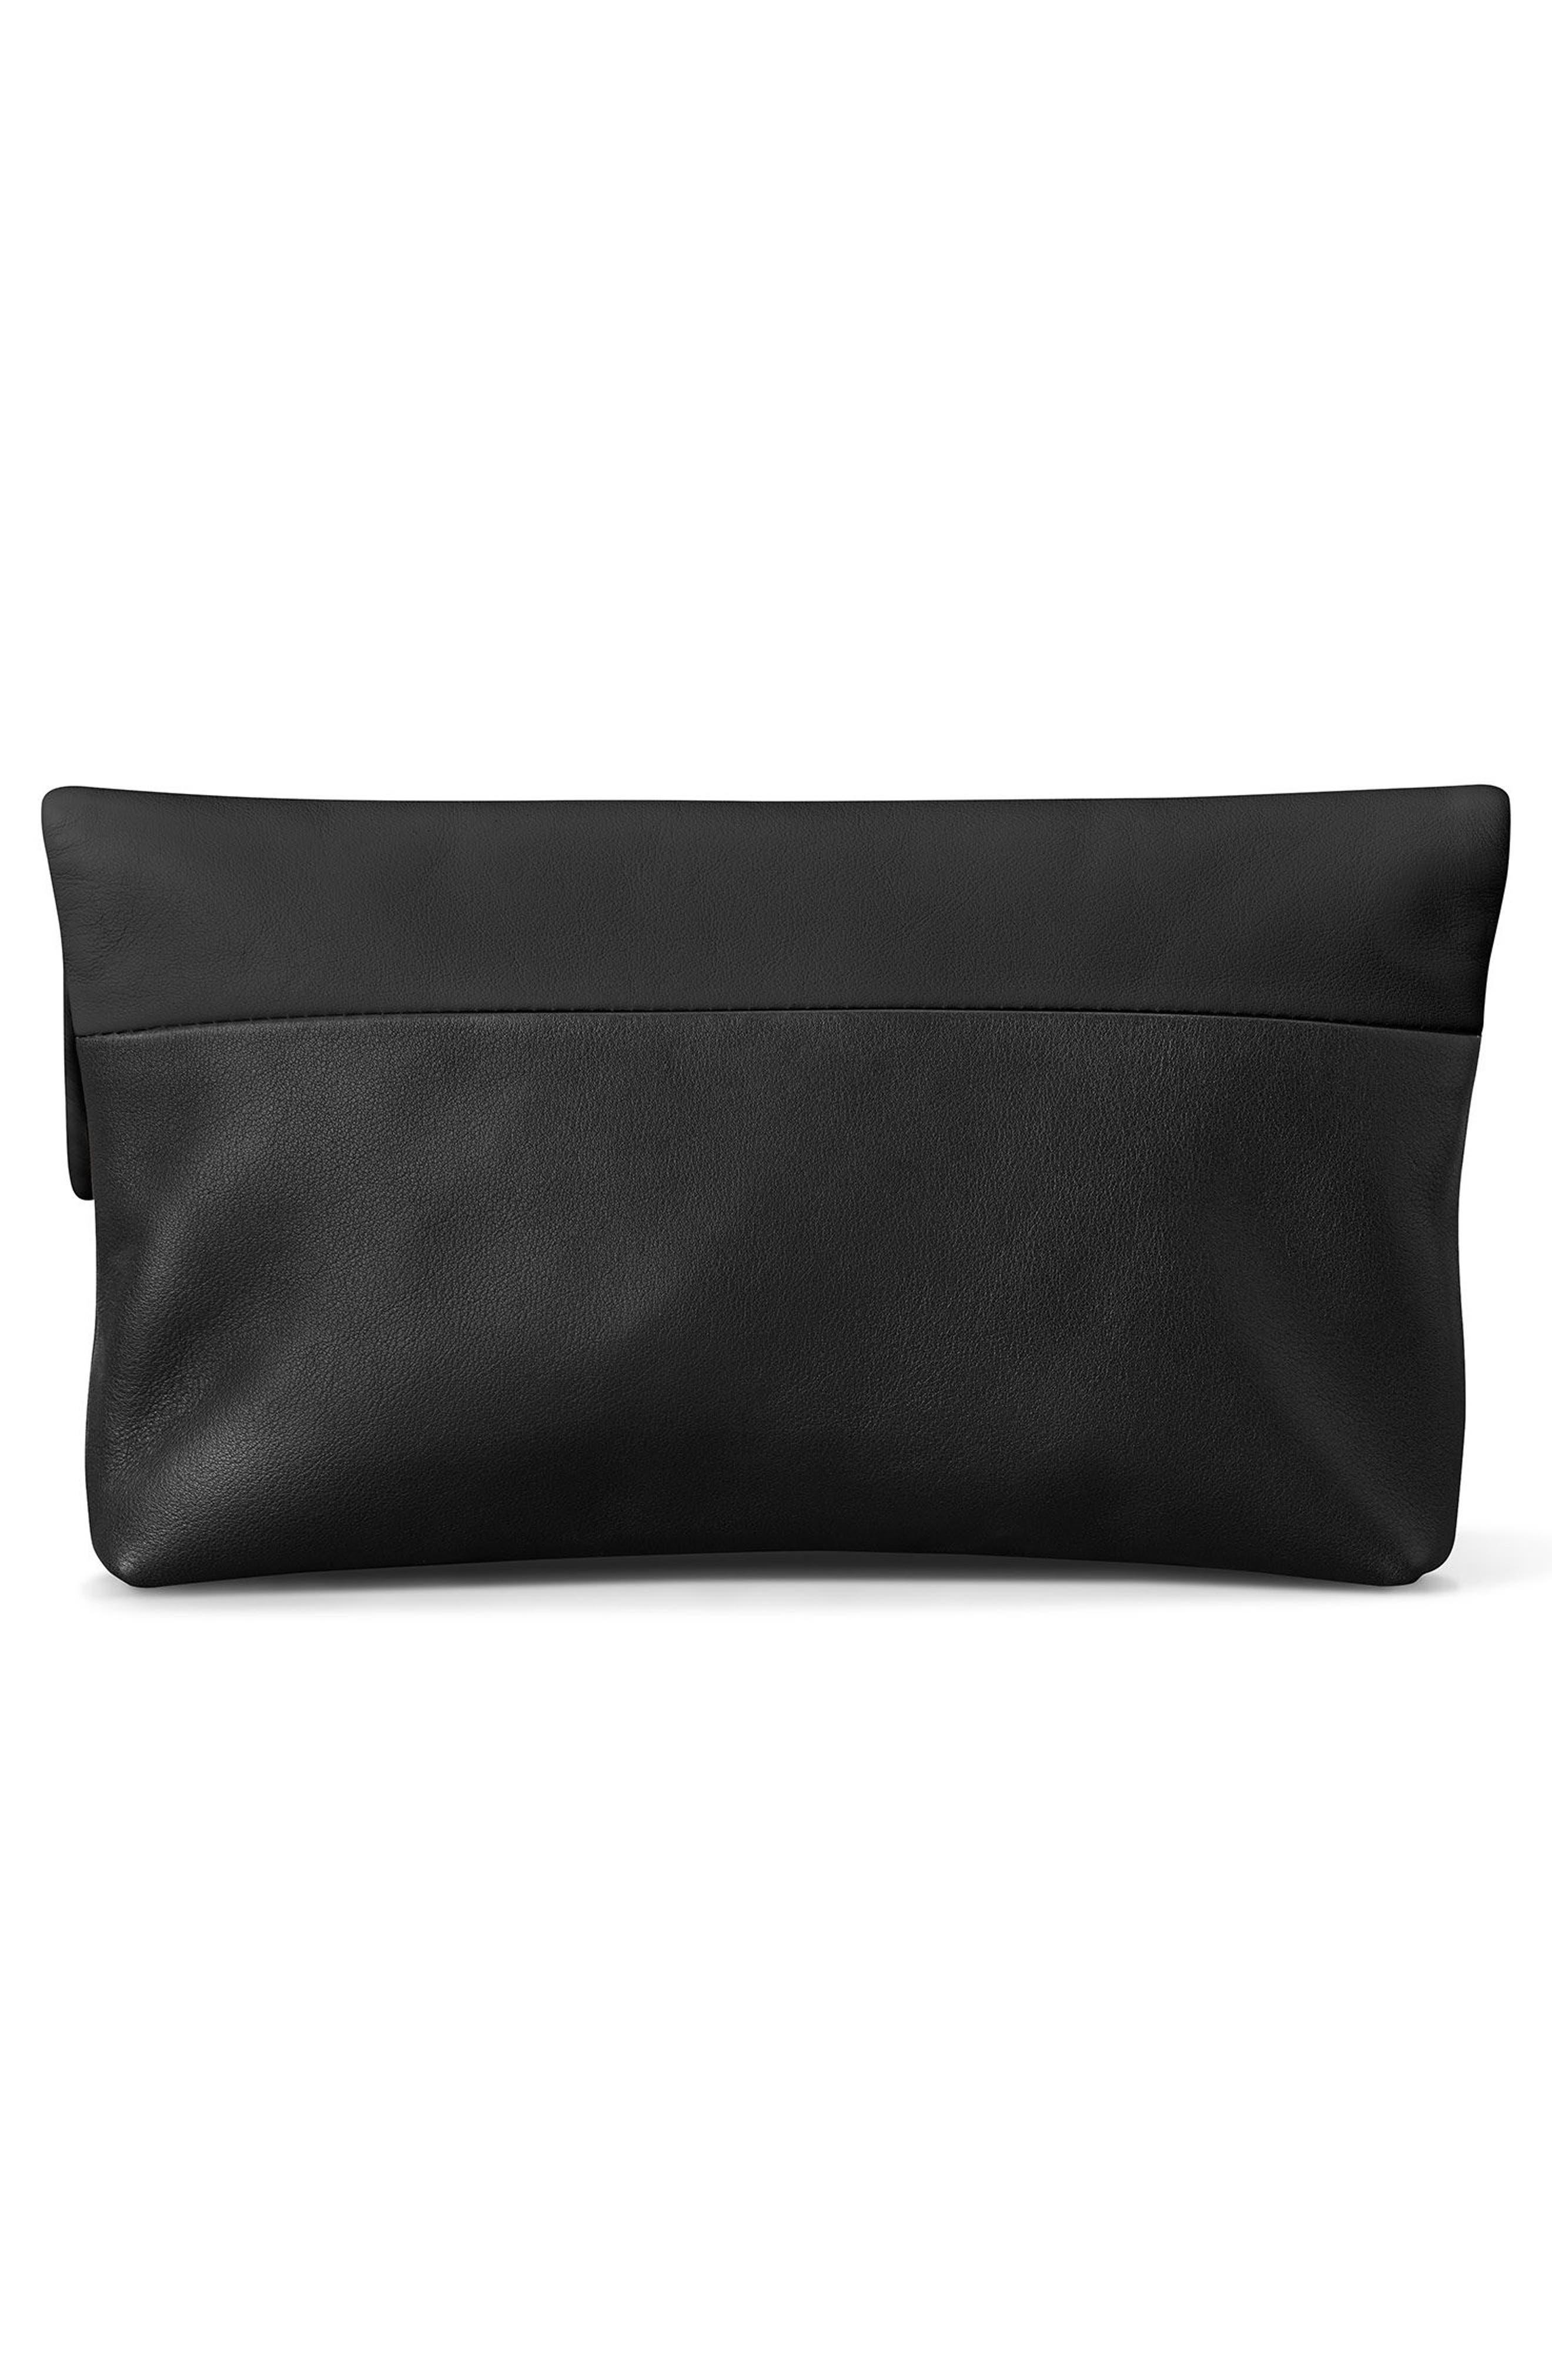 Birdy Leather Foldover Clutch,                             Alternate thumbnail 2, color,                             Black